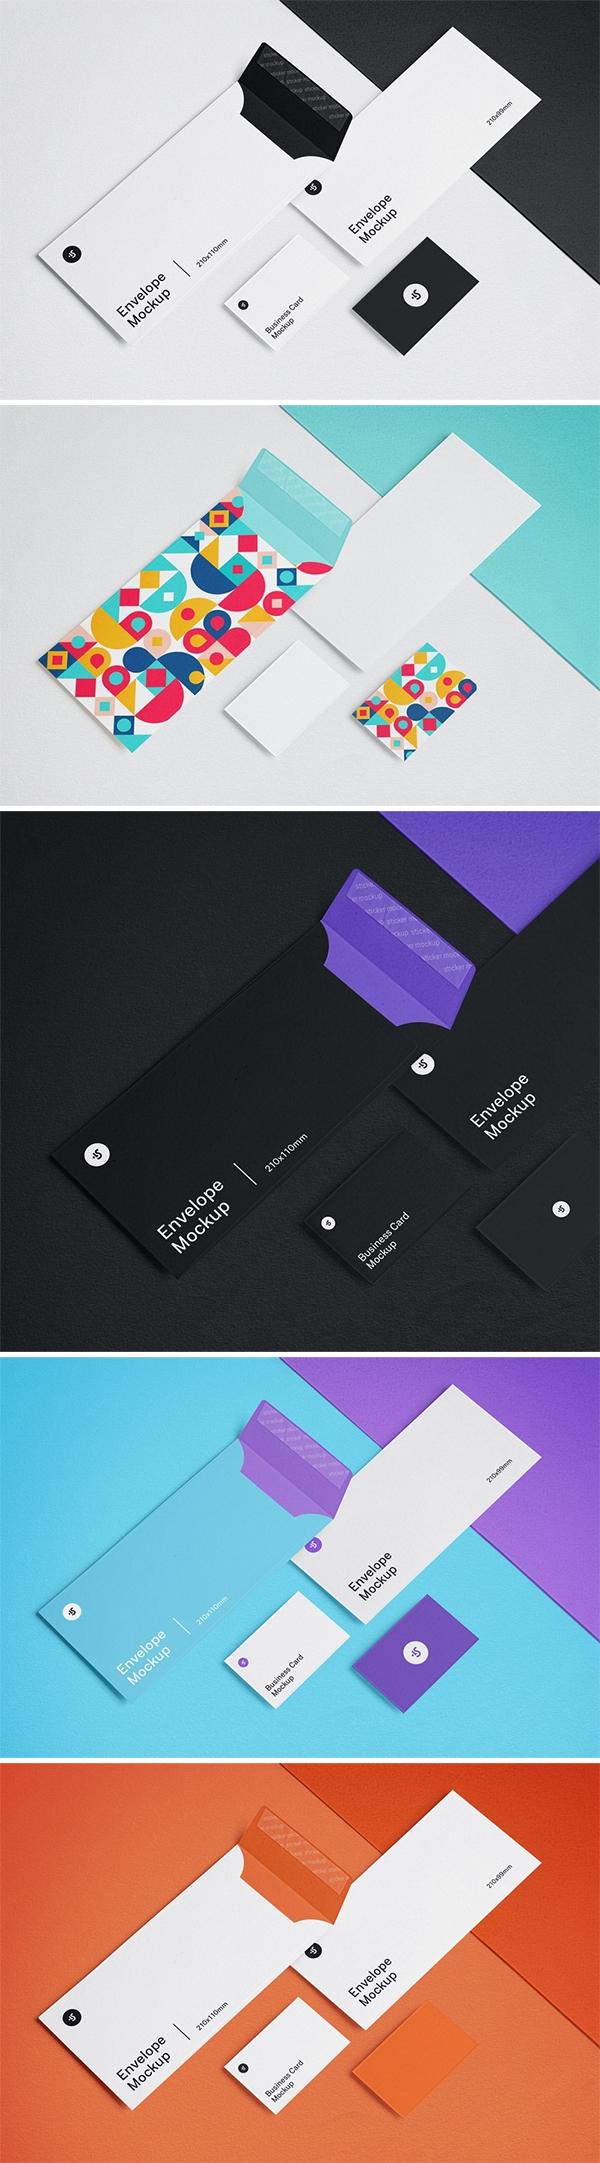 Envelope and Business Card Mockups